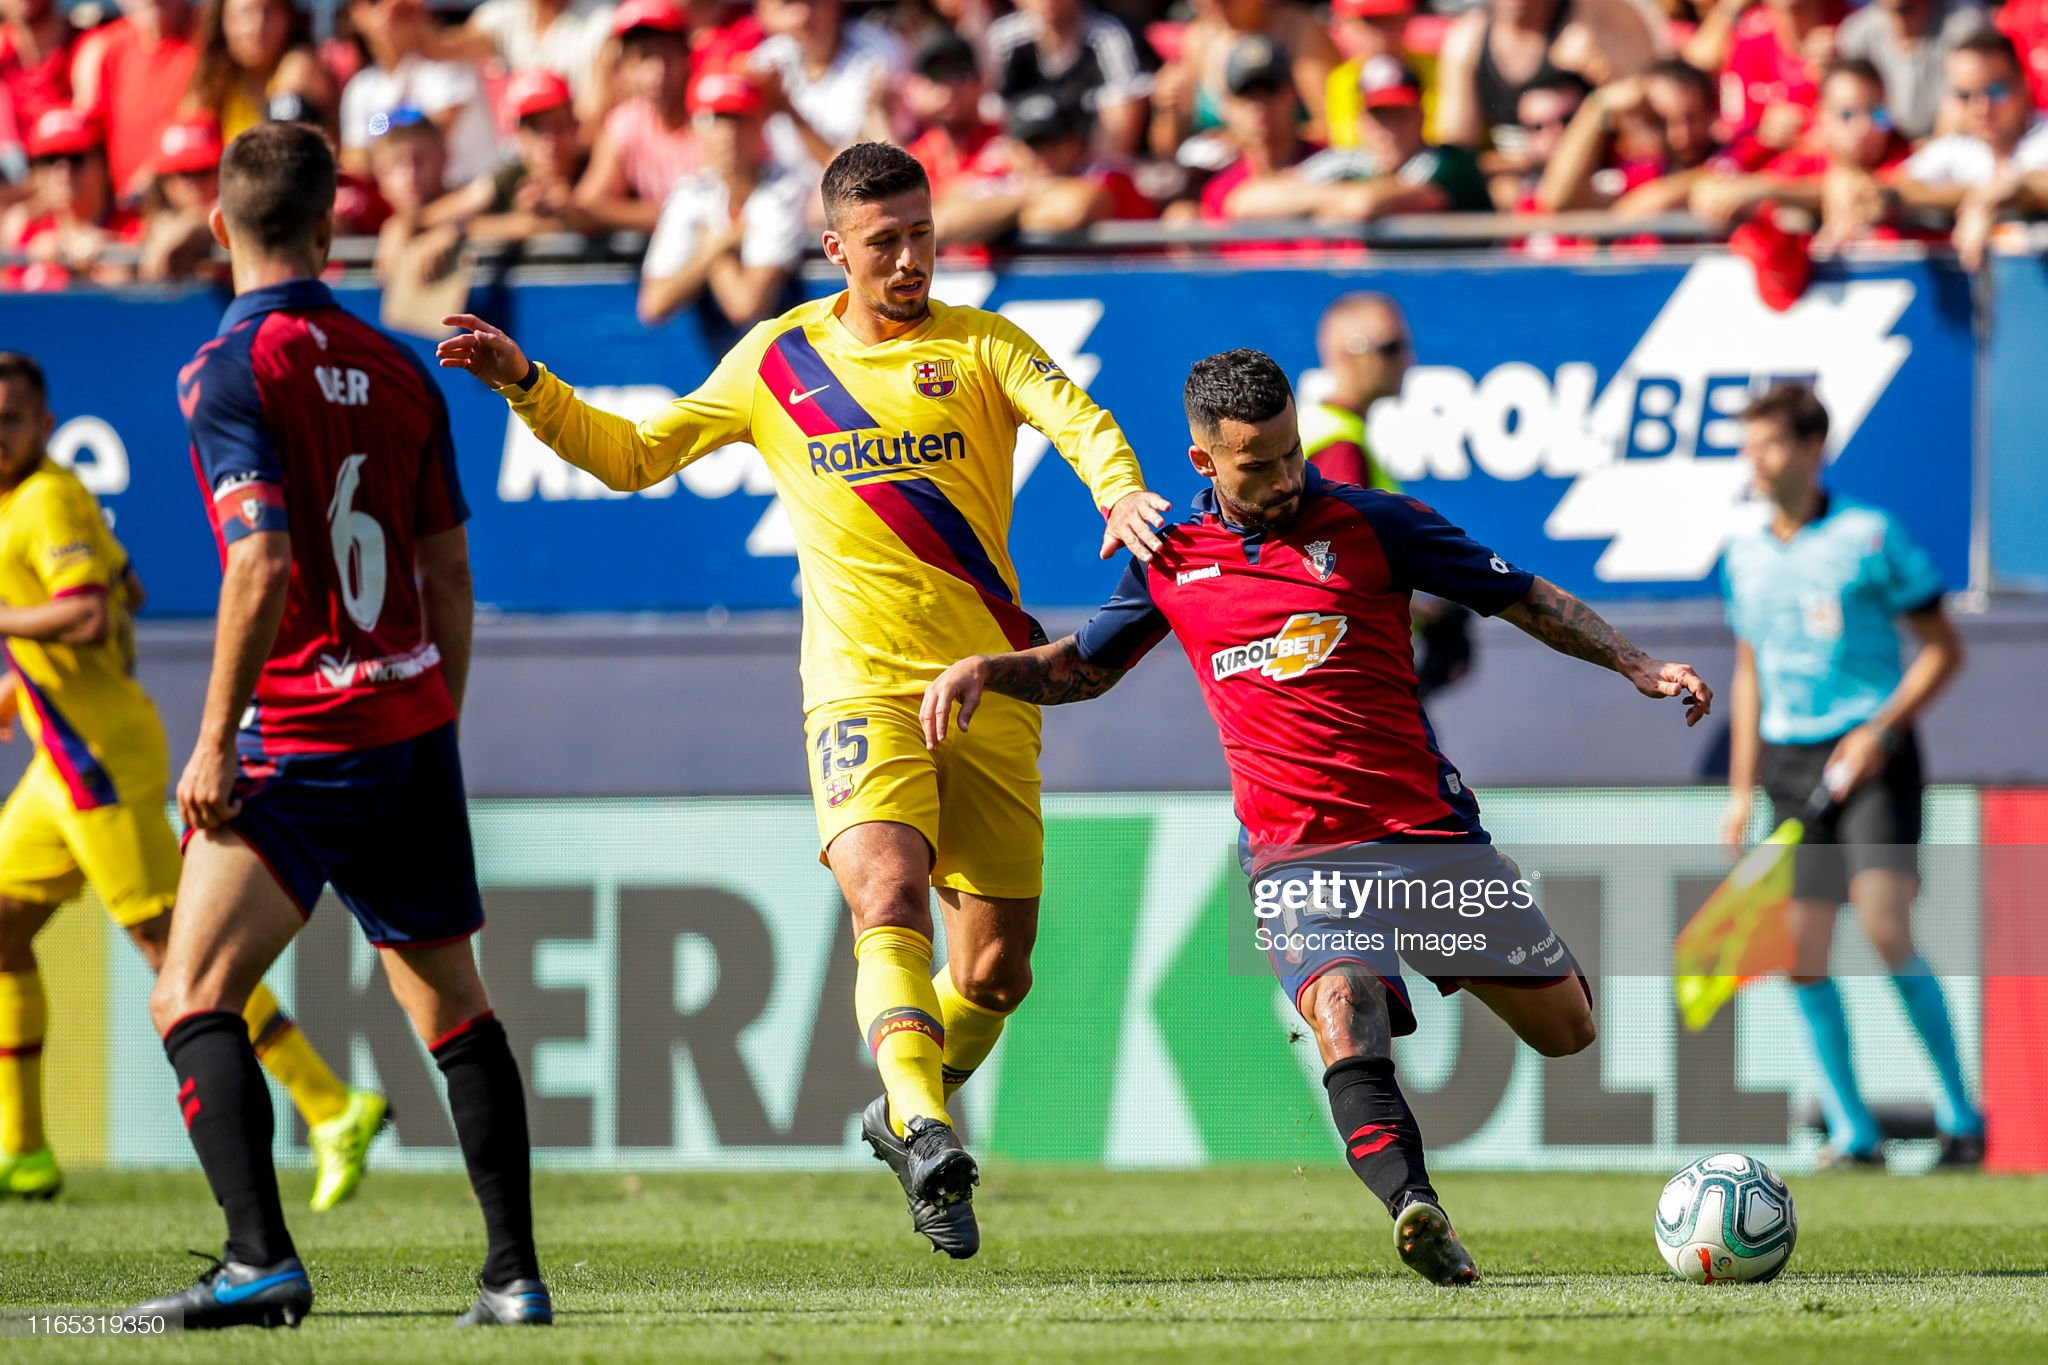 صور مباراة : أوساسونا - برشلونة 2-2 ( 31-08-2019 )  Clement-lenglet-of-fc-barcelona-ruben-garcia-of-ca-osasuna-during-the-picture-id1165319350?s=2048x2048